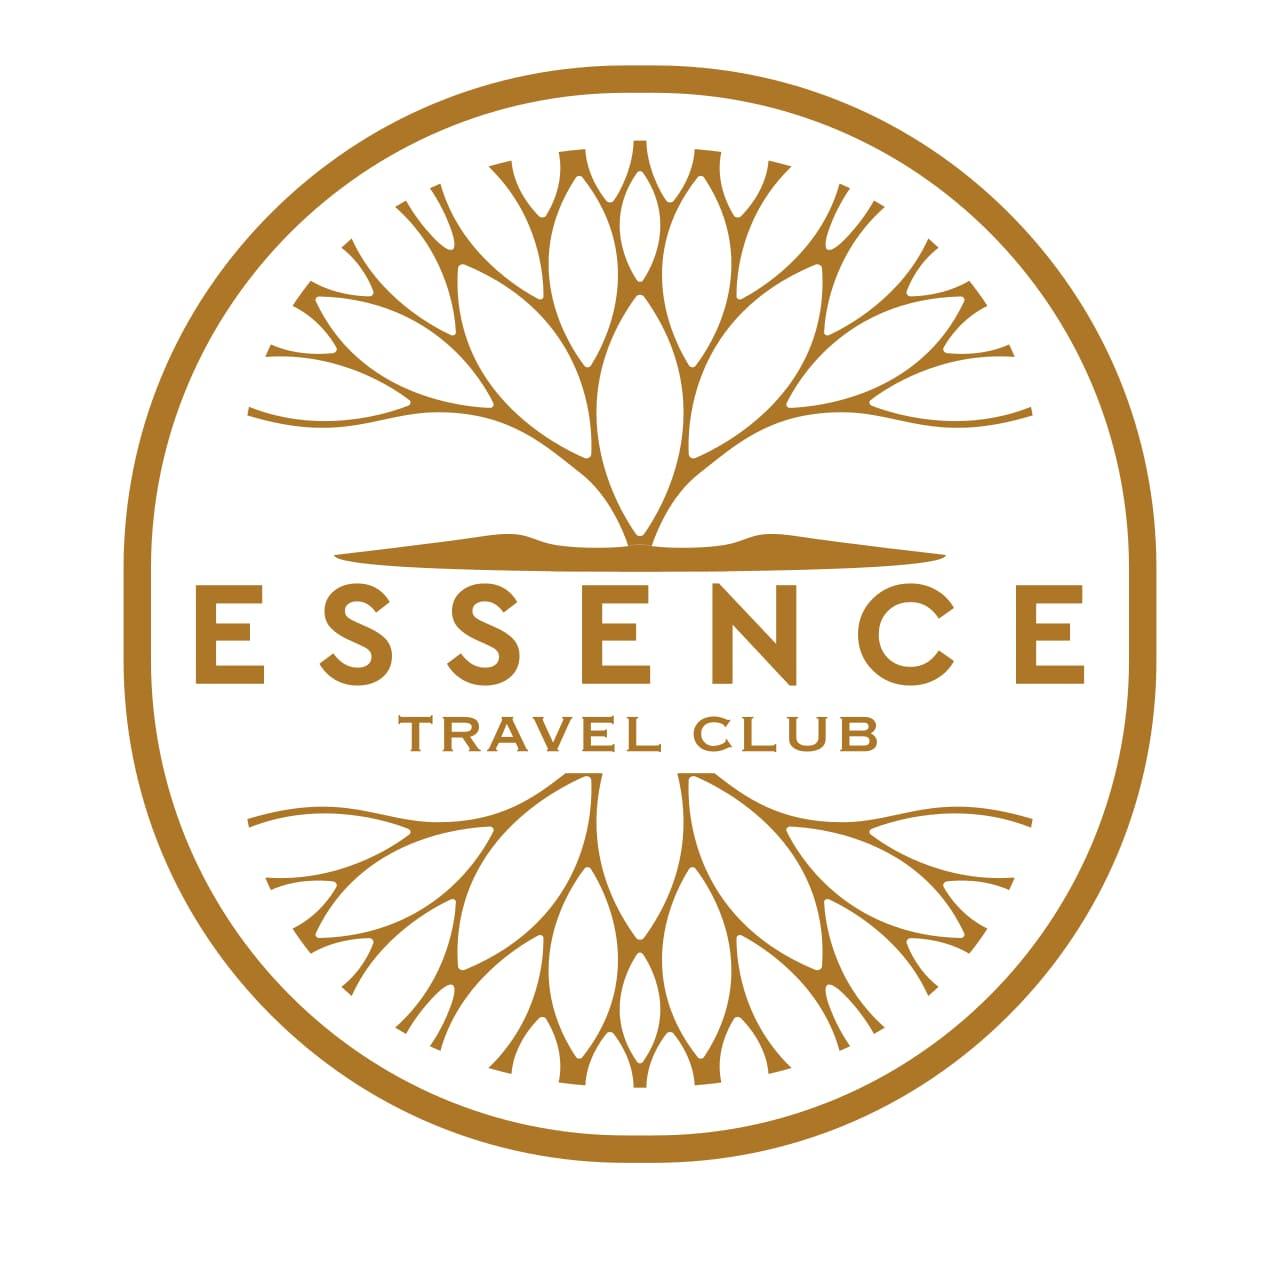 EssenceTravel